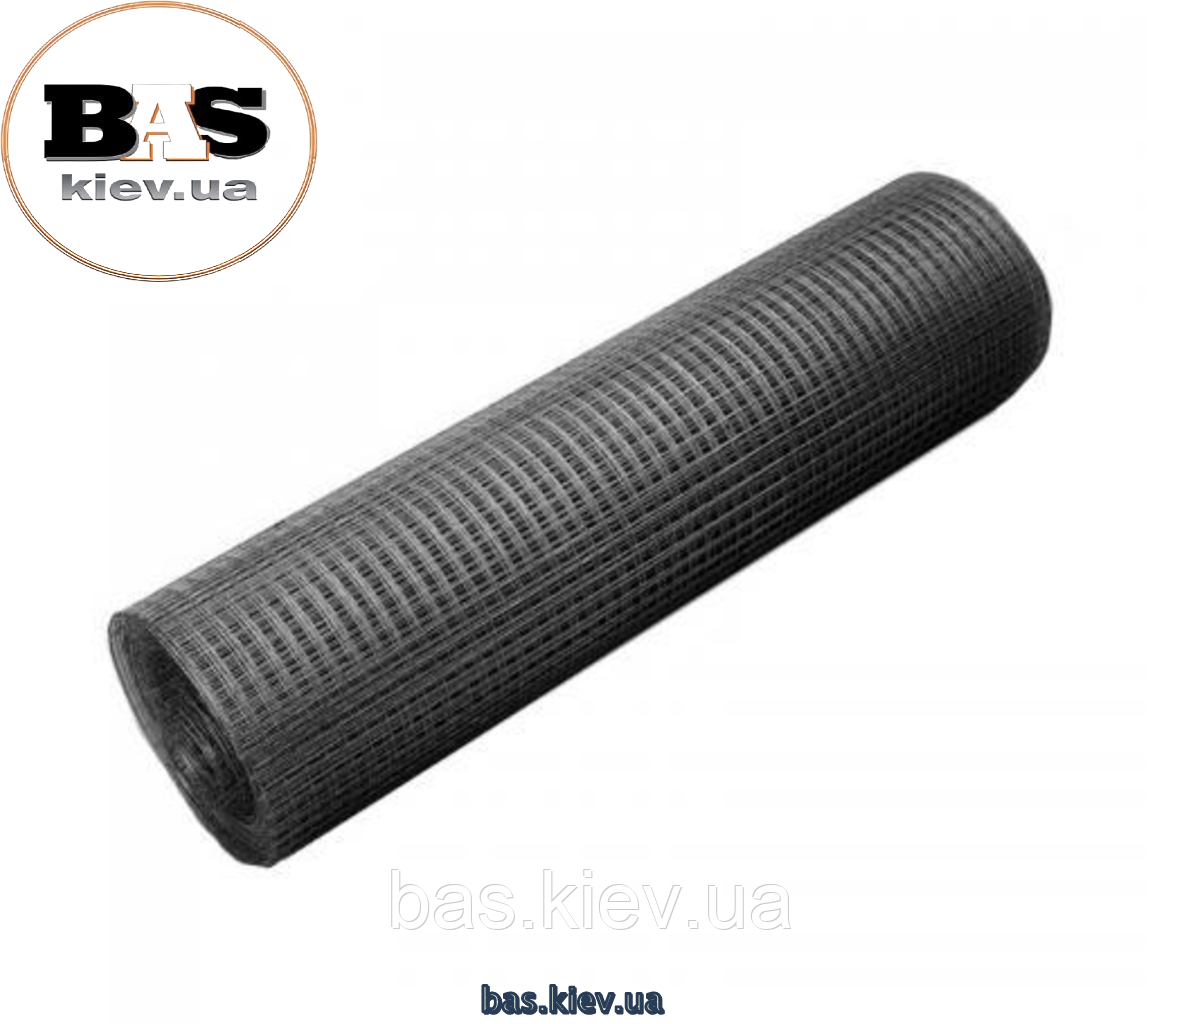 Сетка сварная штукатурная металическая 25*12 * 0,6 мм , рулон 30м2